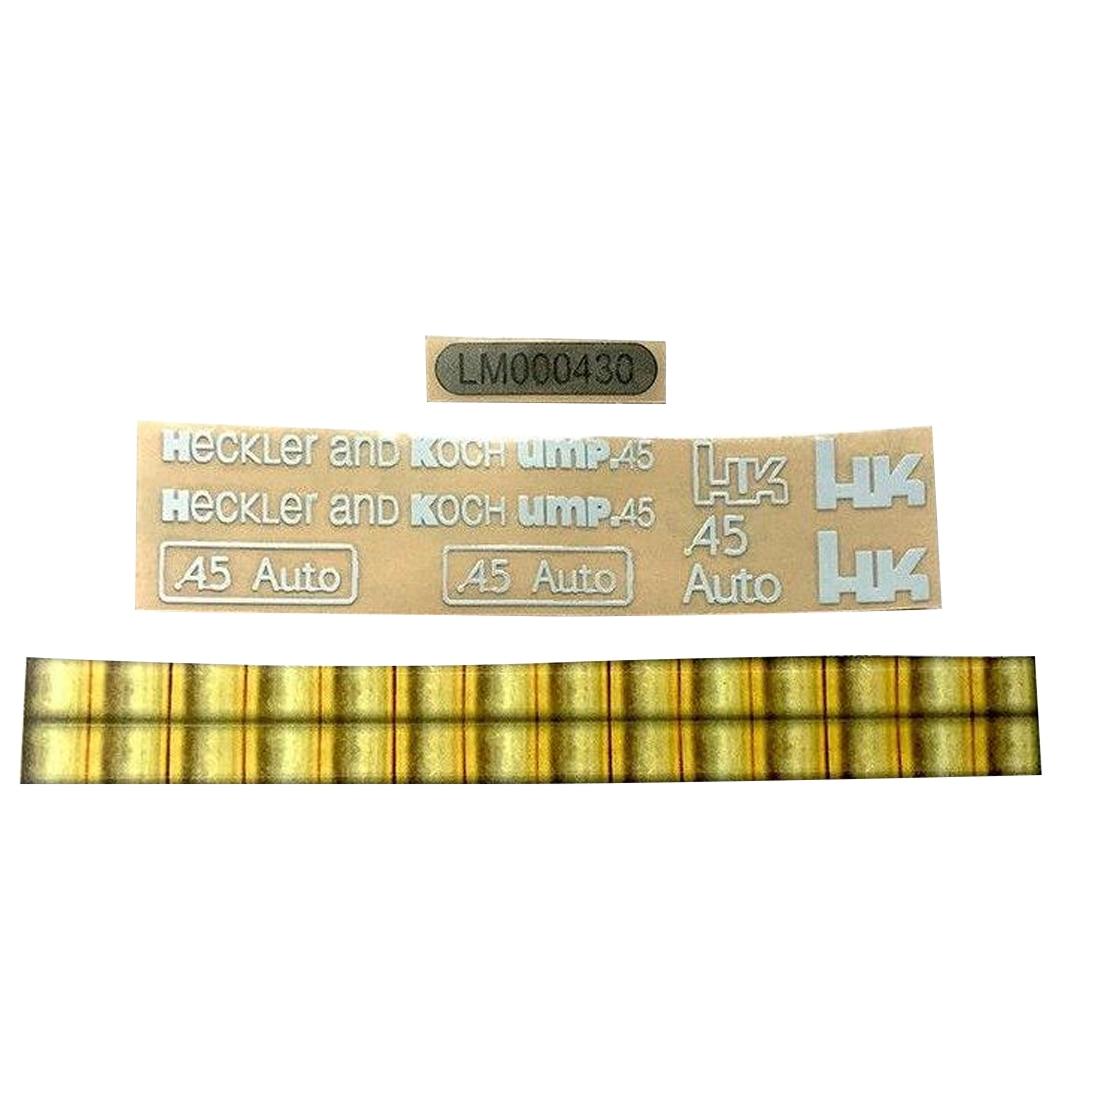 Surwish Metal Stickers For UMP45/HK Water Gel Beads